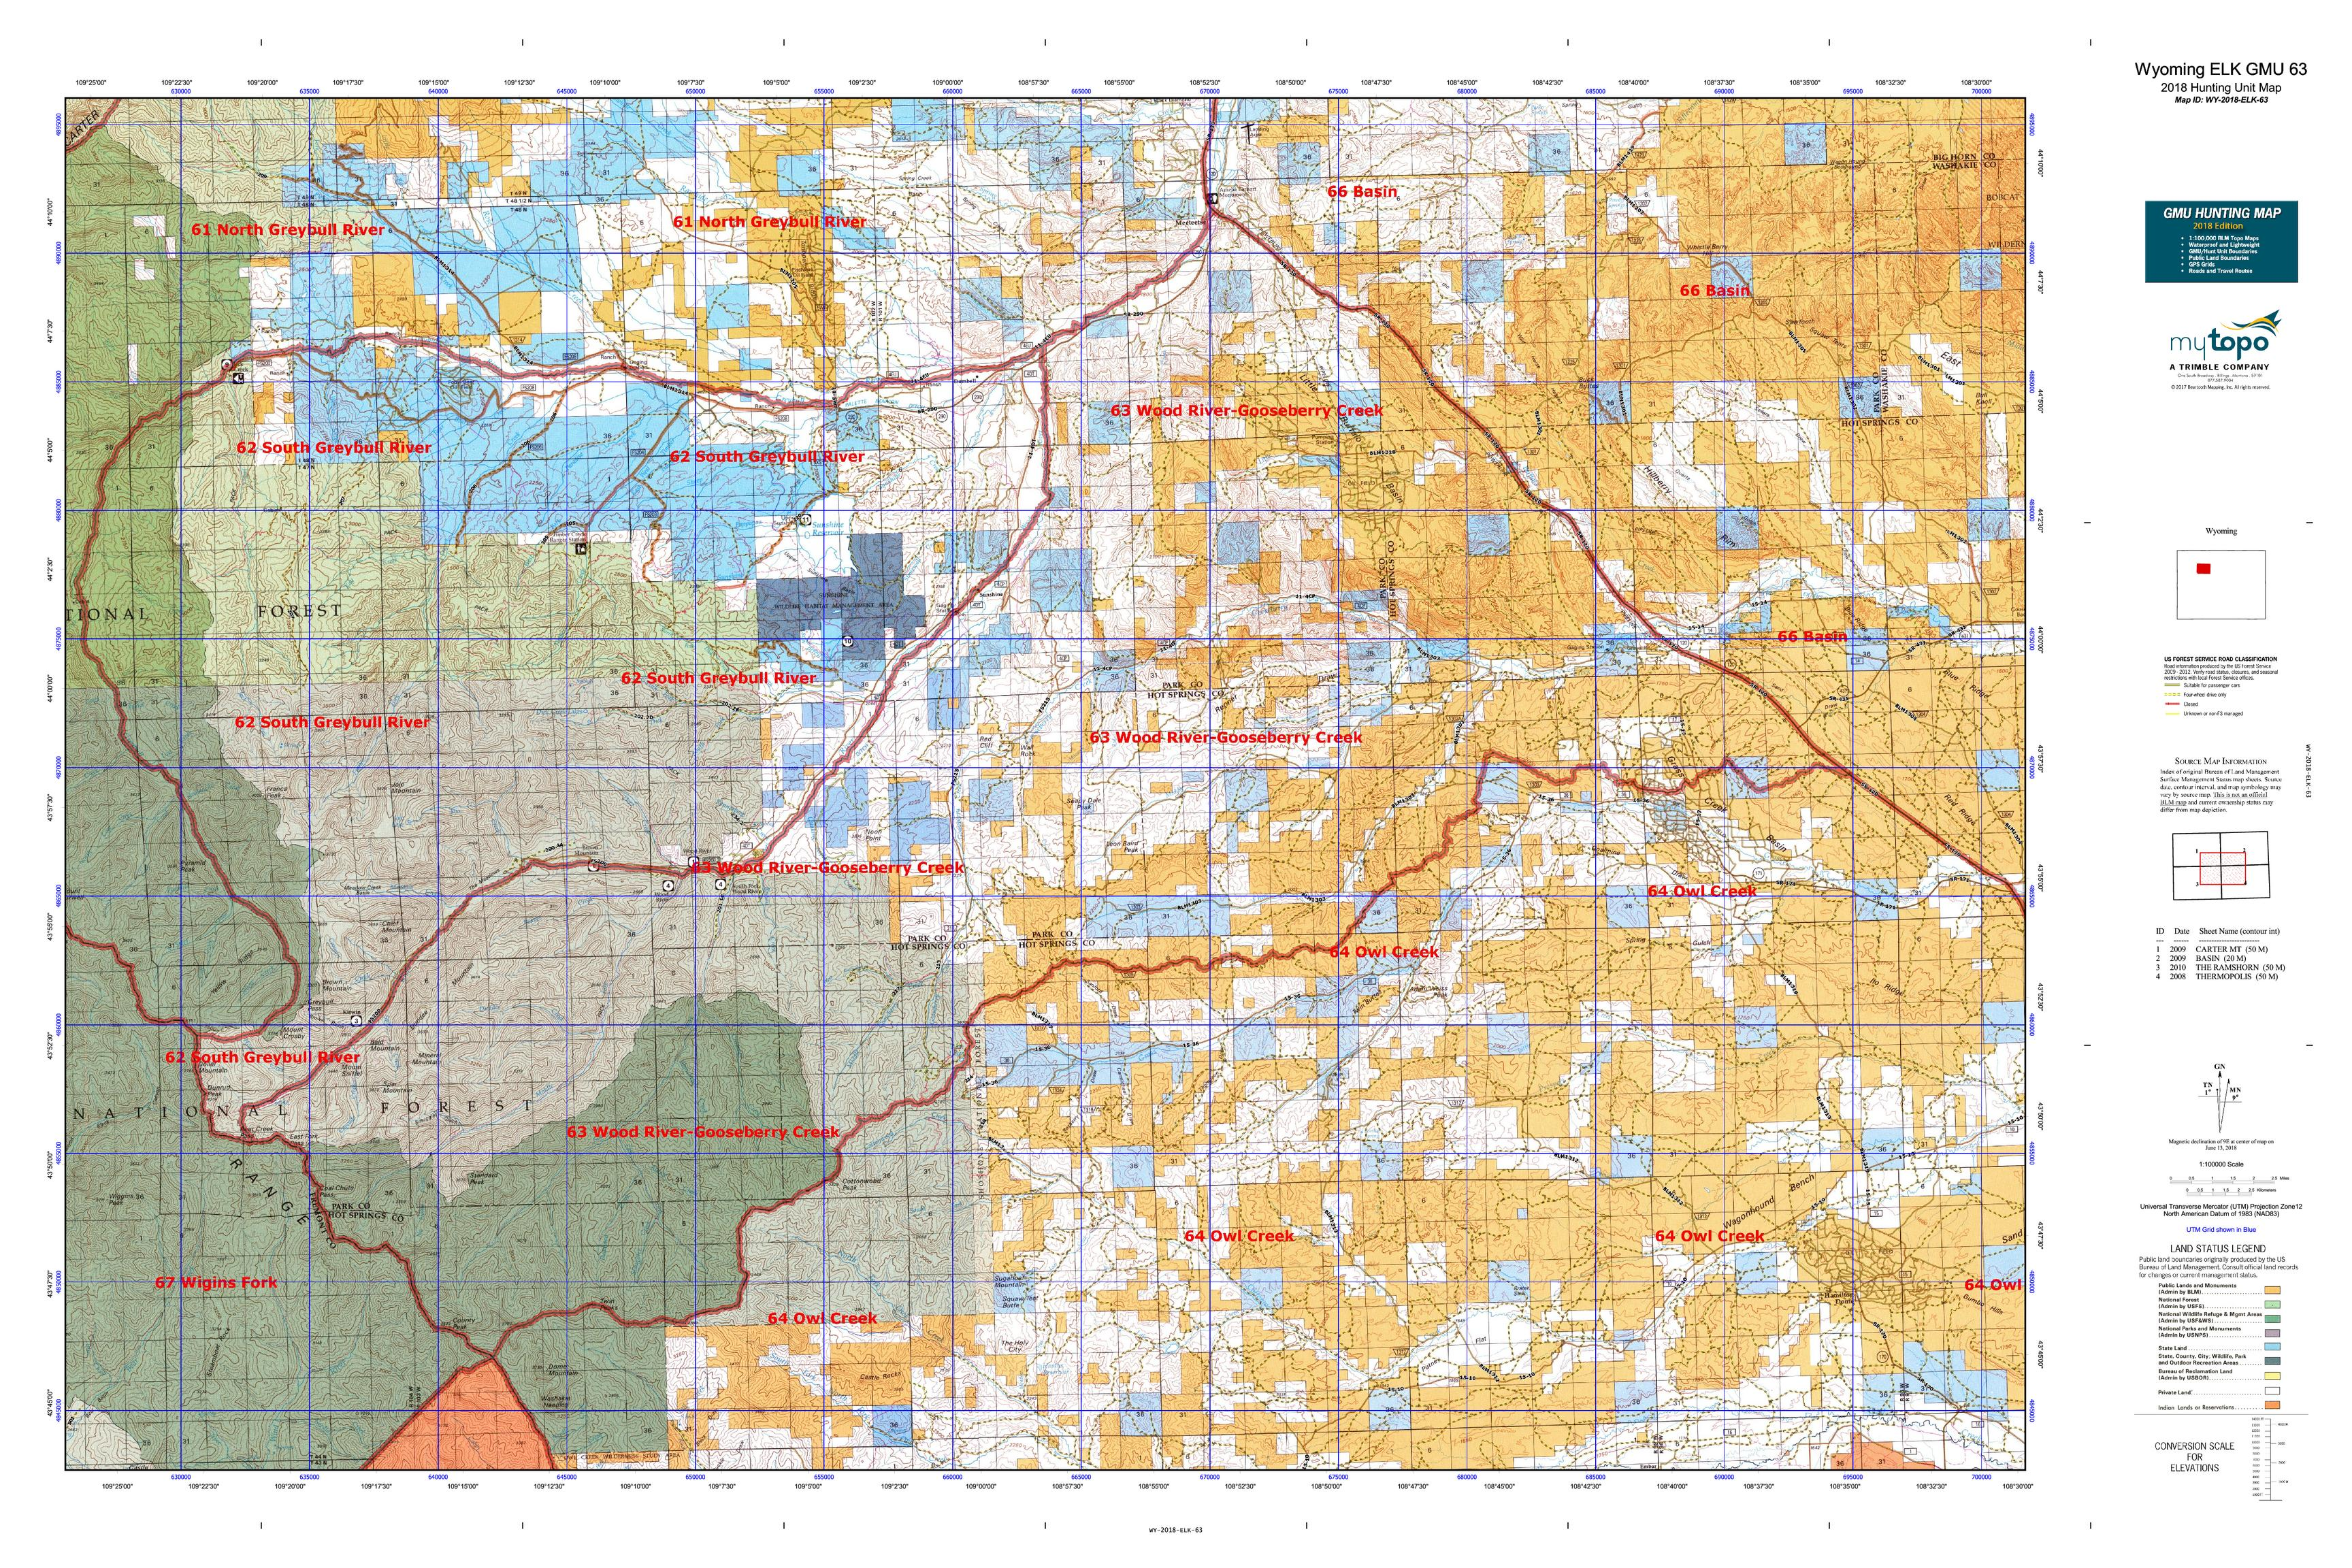 Wyoming ELK GMU 63 Map | MyTopo